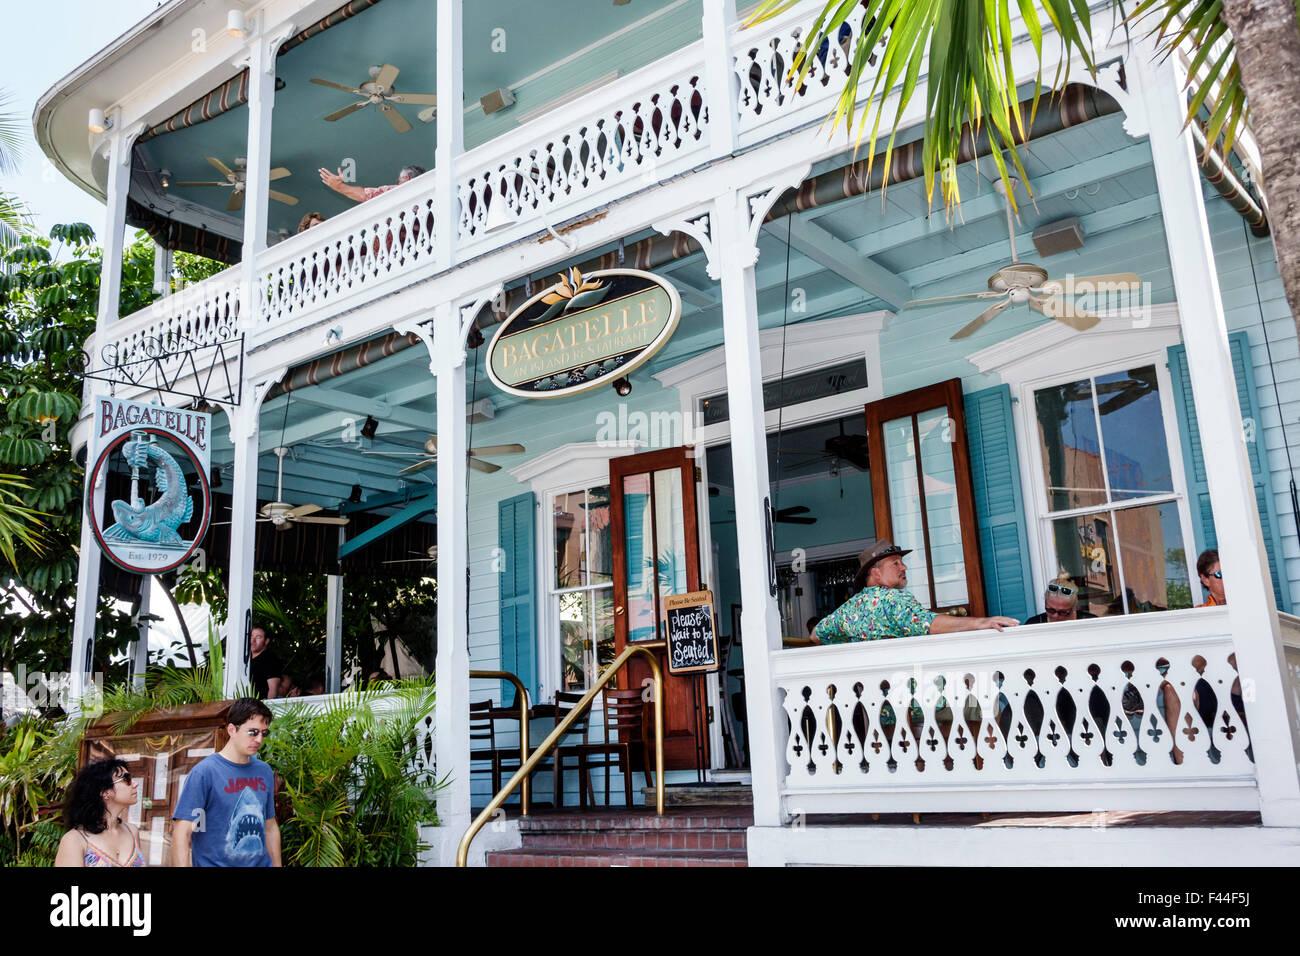 Key West Florida Keys Duval Street Bagatelle Restaurant Front Stock